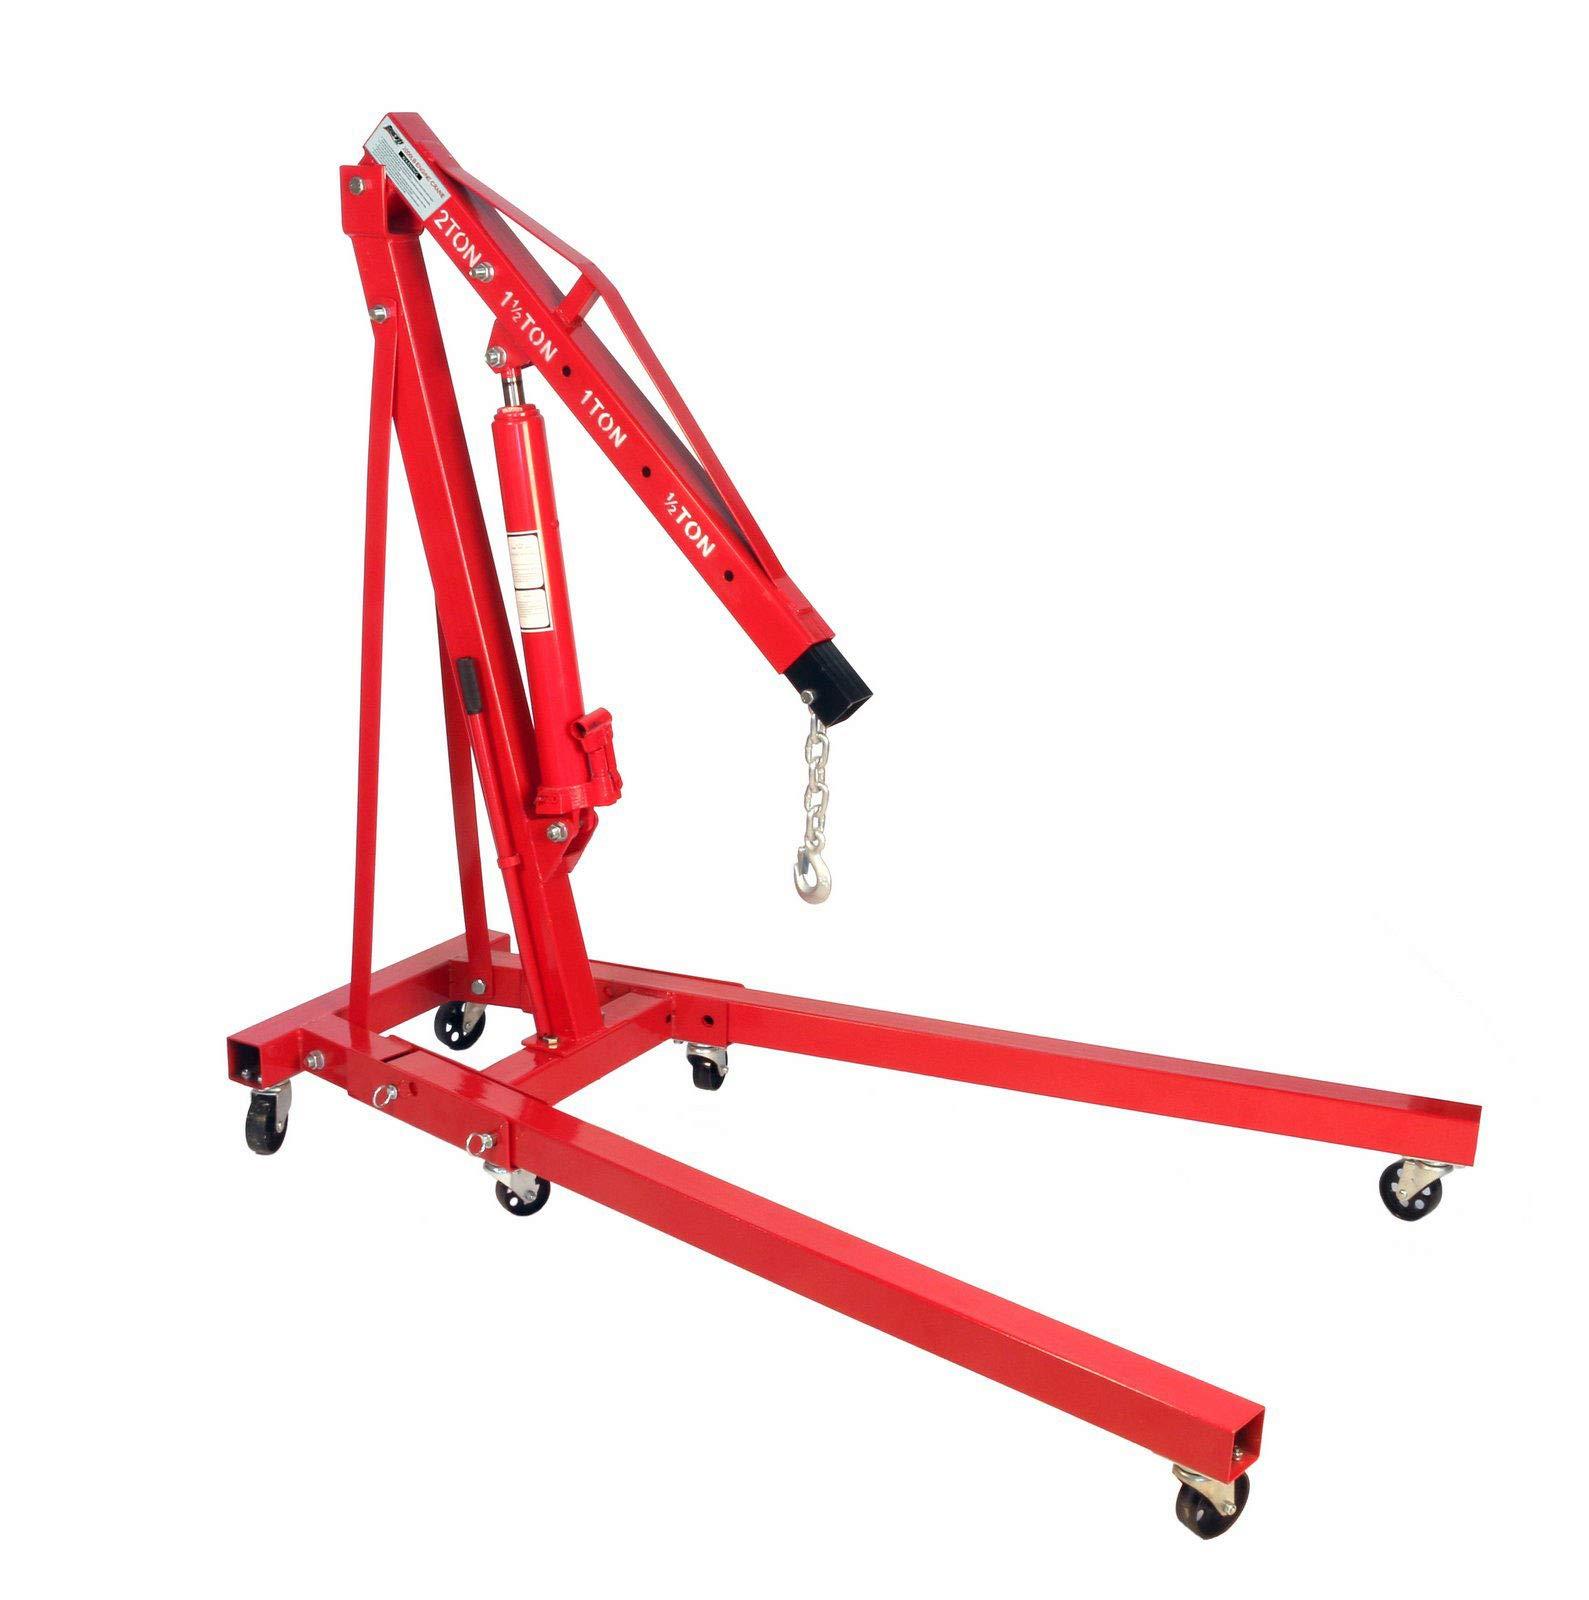 Dragway Tools 2 Ton Folding Hydraulic Engine Hoist Cherry Picker Shop Crane Hoist Lift by Dragway Tools